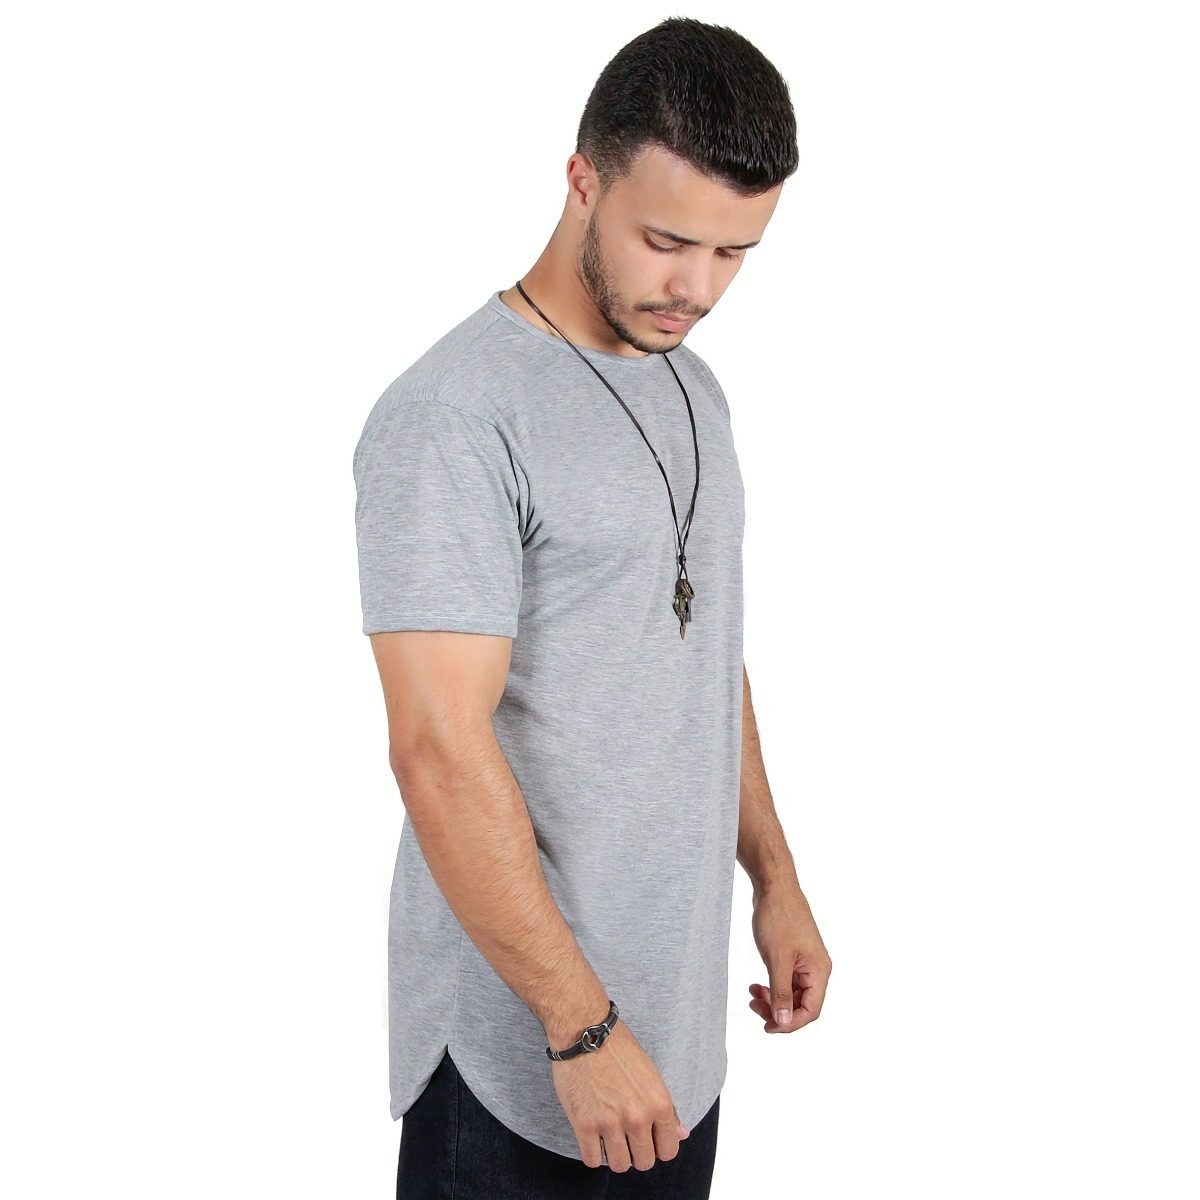 072ef411d Kit C/3 Un Camisas Blusas Masculinas Tamanhos Grandes Long - R$ 99 ...